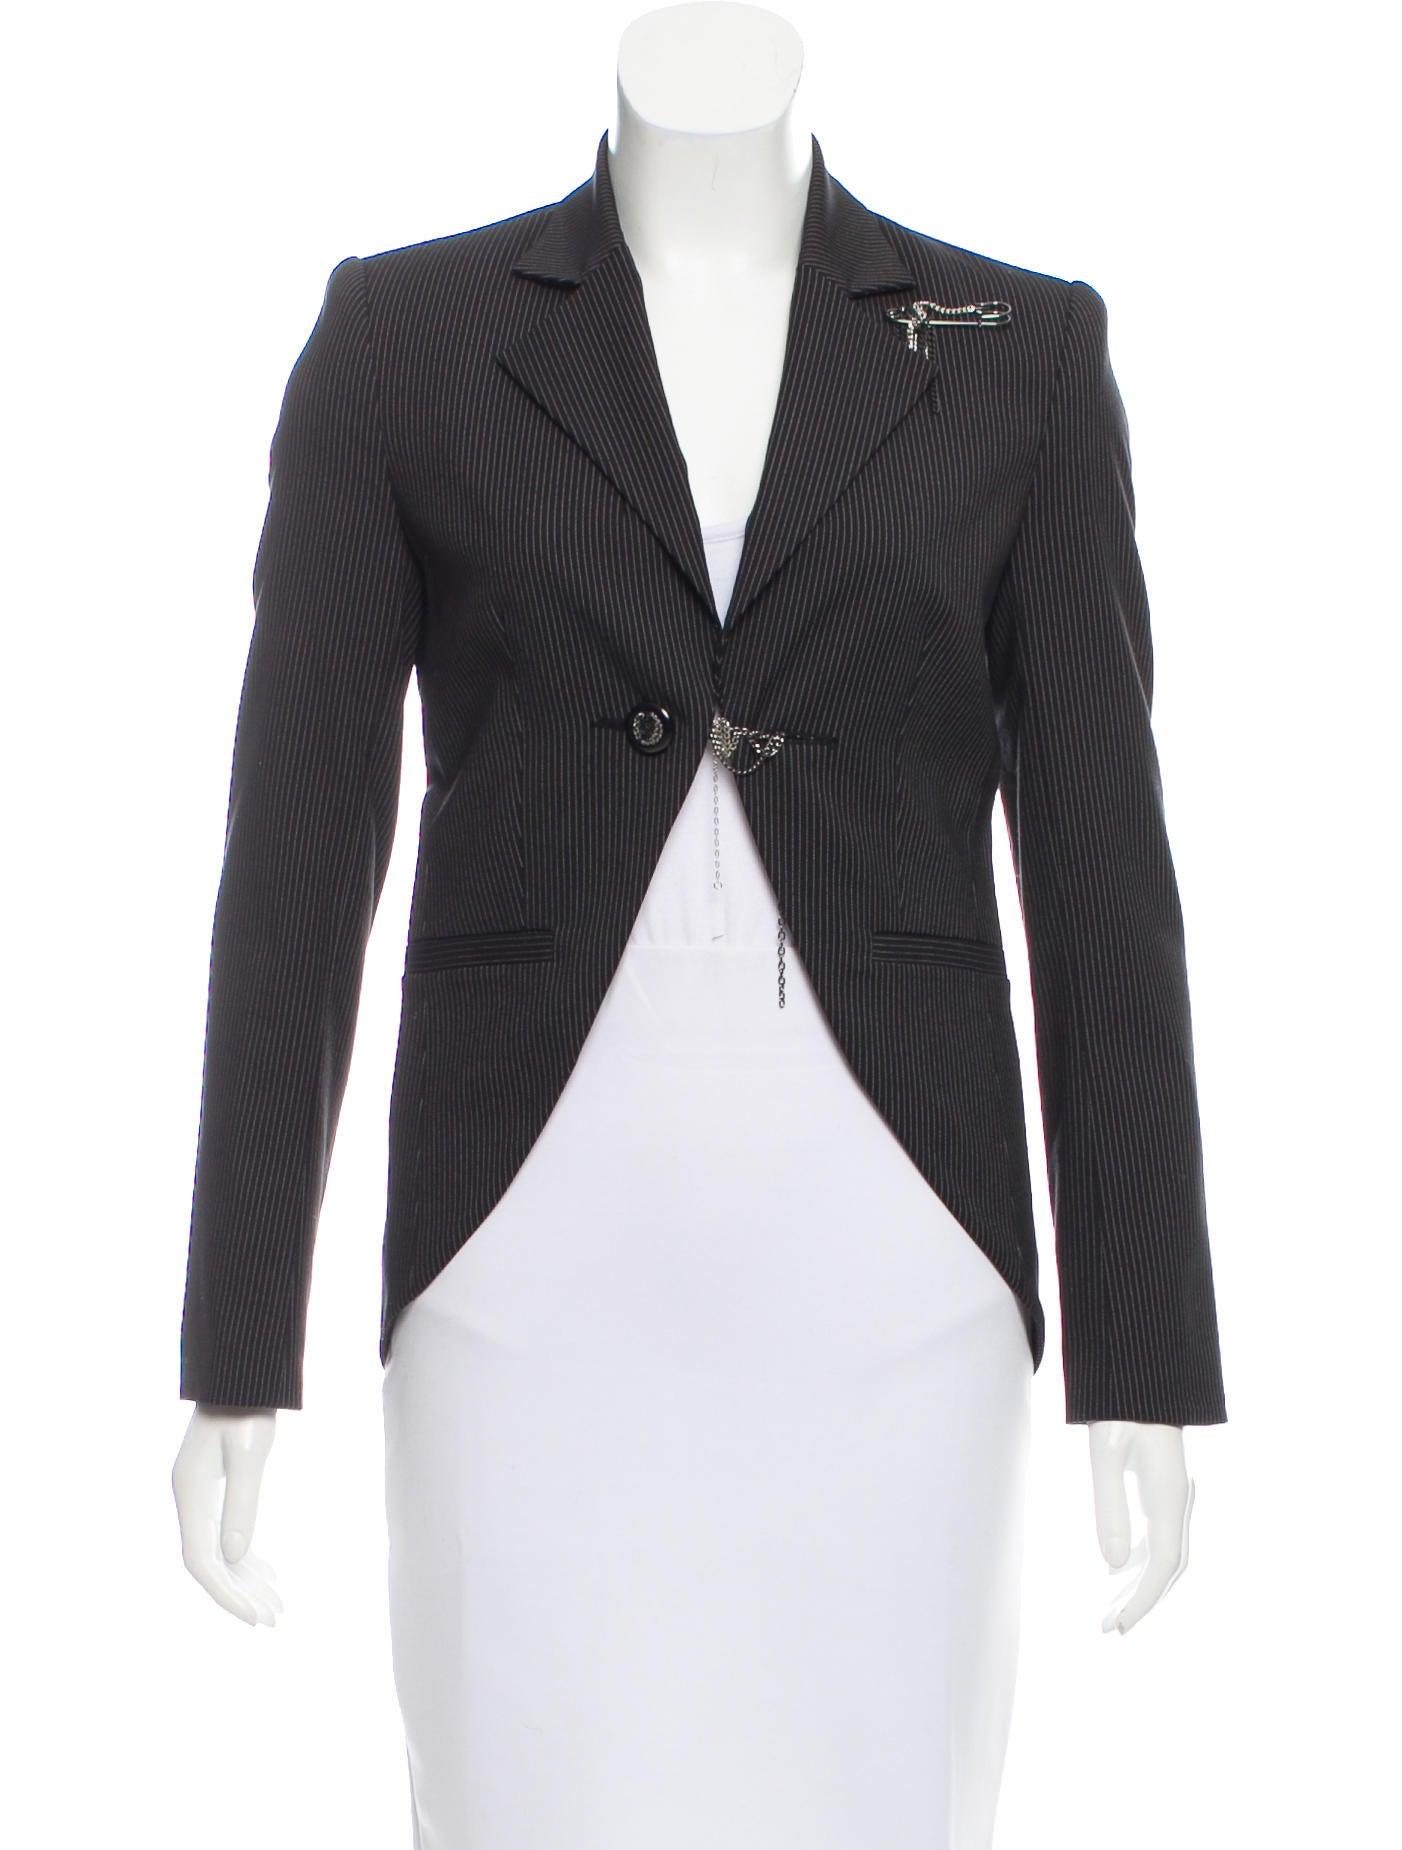 9cc82ad430f0f2 Alice + Olivia Embellished Pinstripe Blazer - Clothing - WAO64705 ...